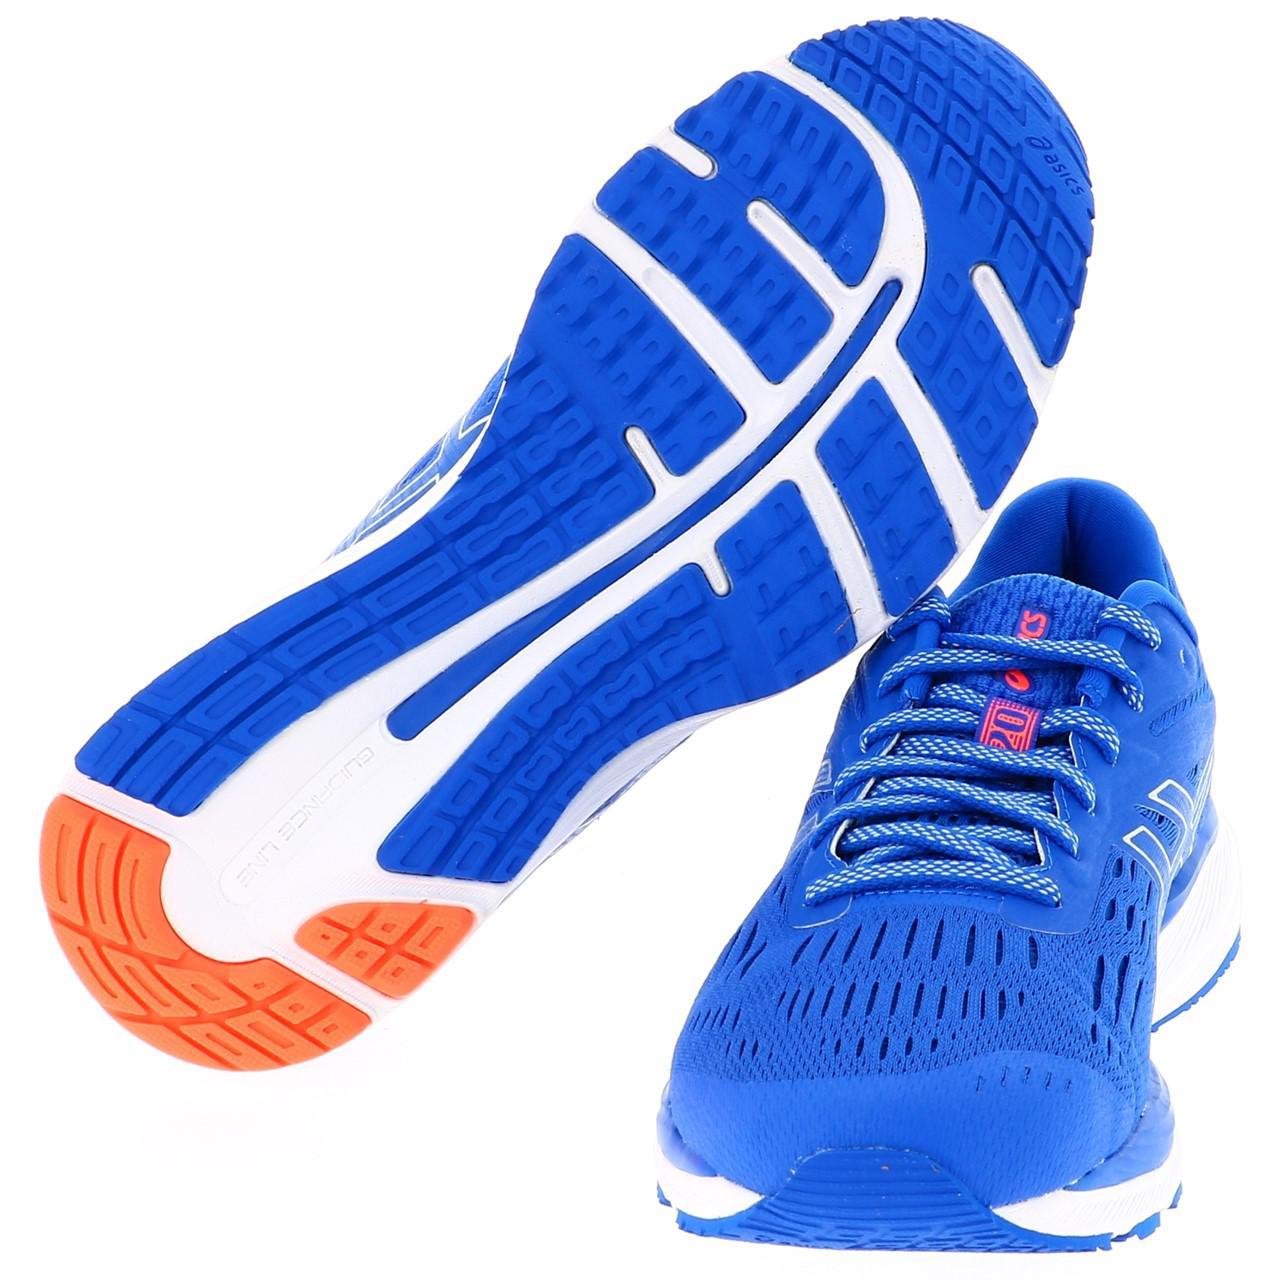 16967 Zapatillas 20 de Blue Gel Nuevo Run Asics Cumulus running 48wqR